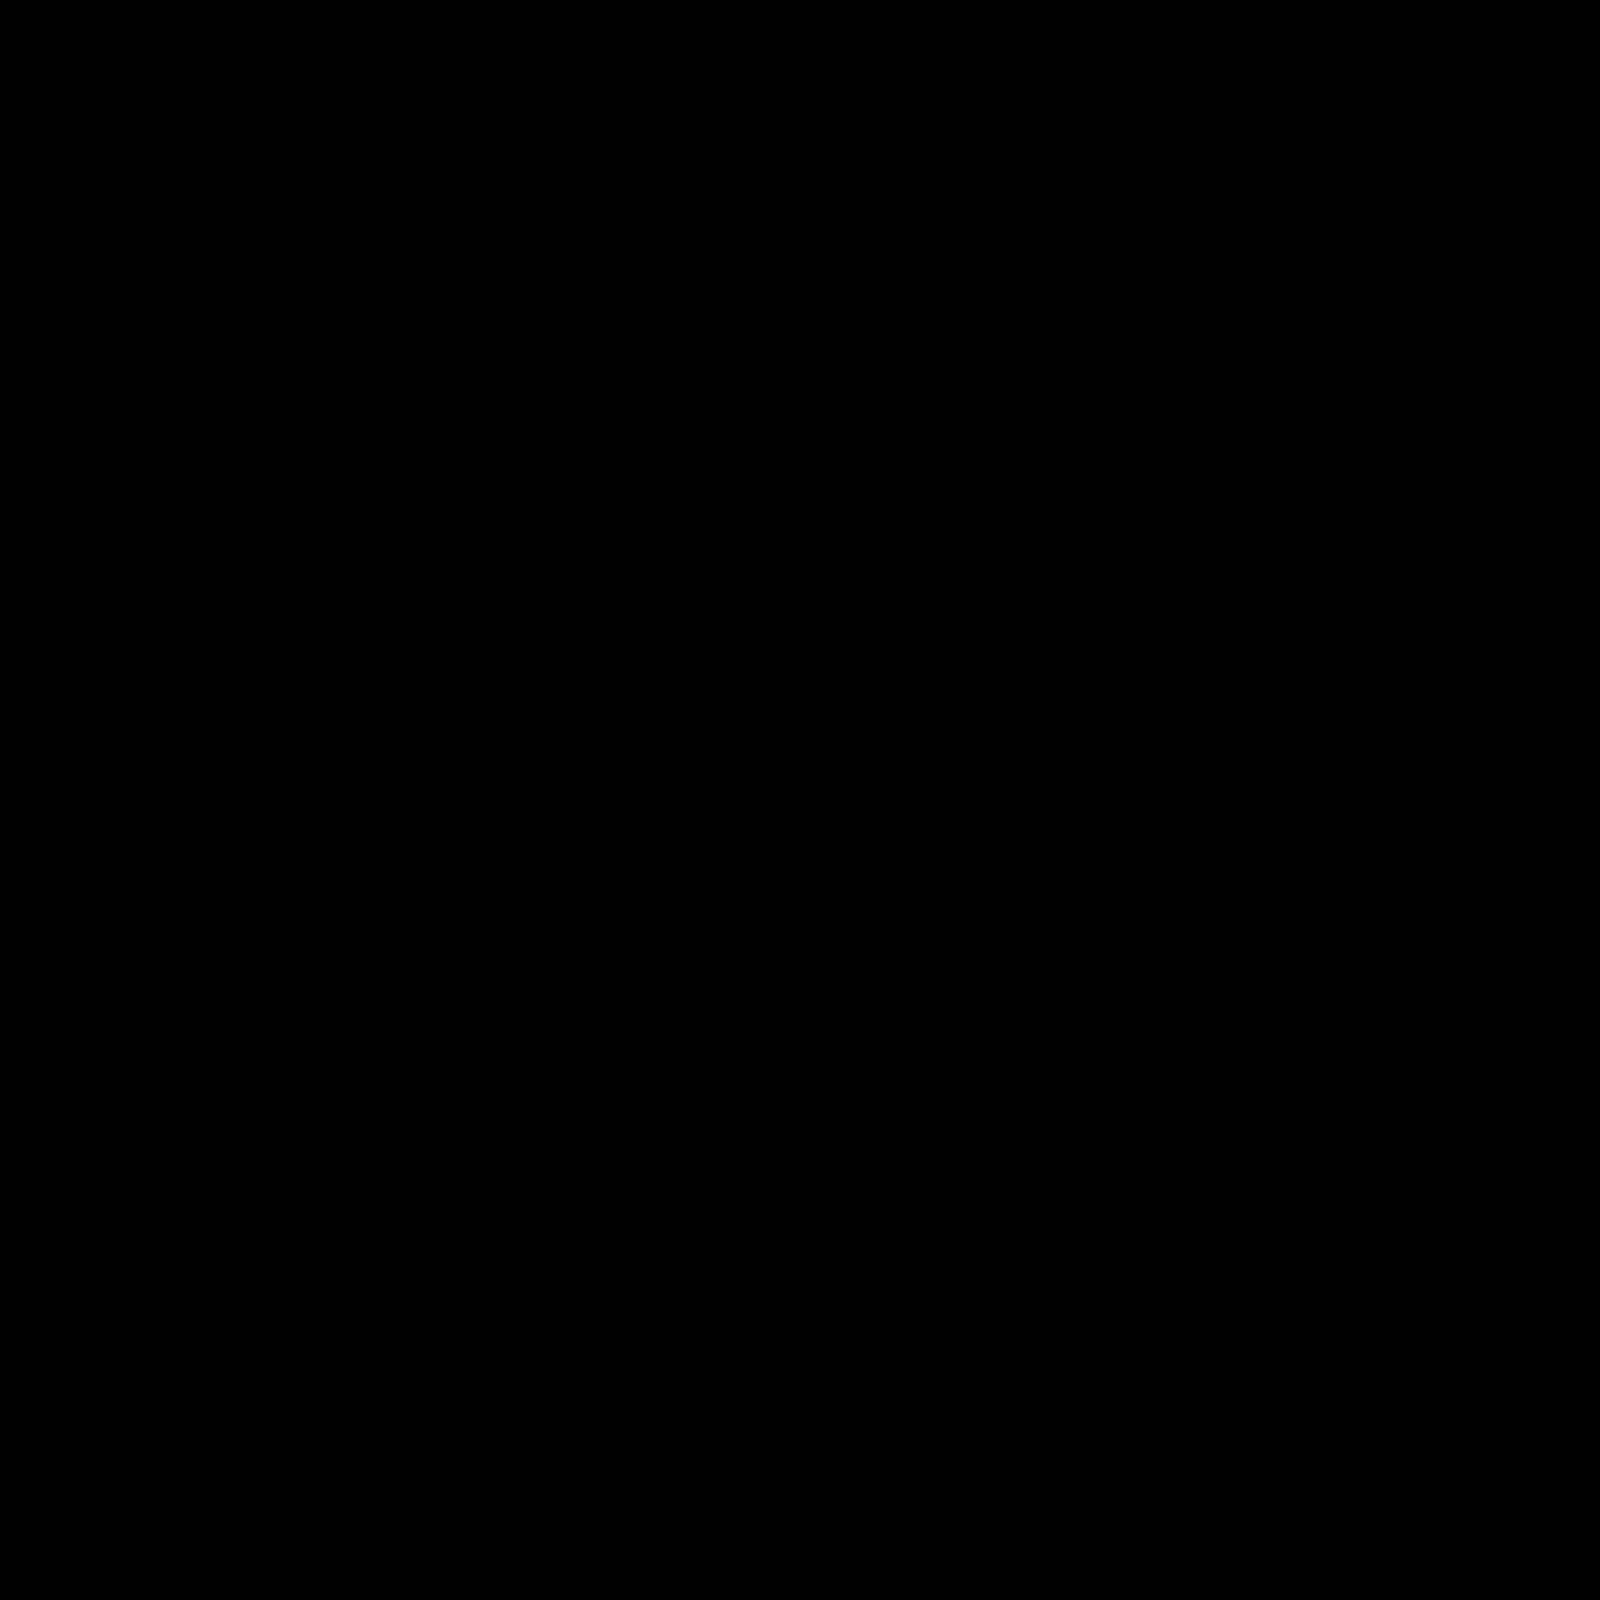 Drukarka 3D icon